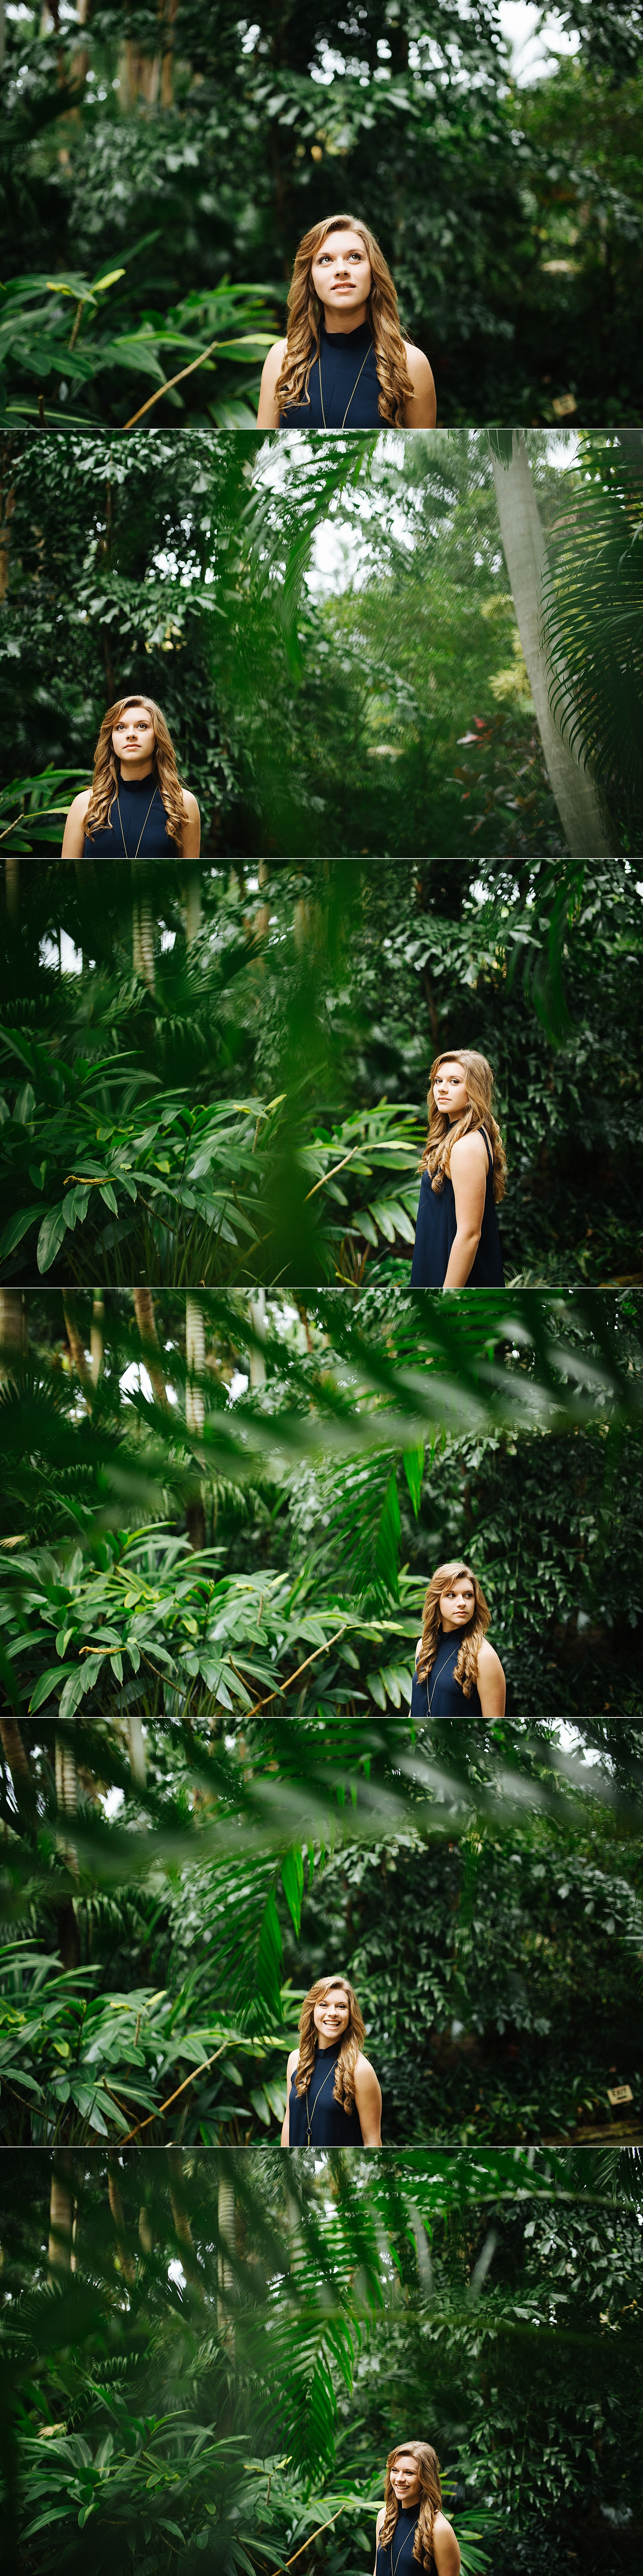 stpete senior portraits sunken gardens leah-13